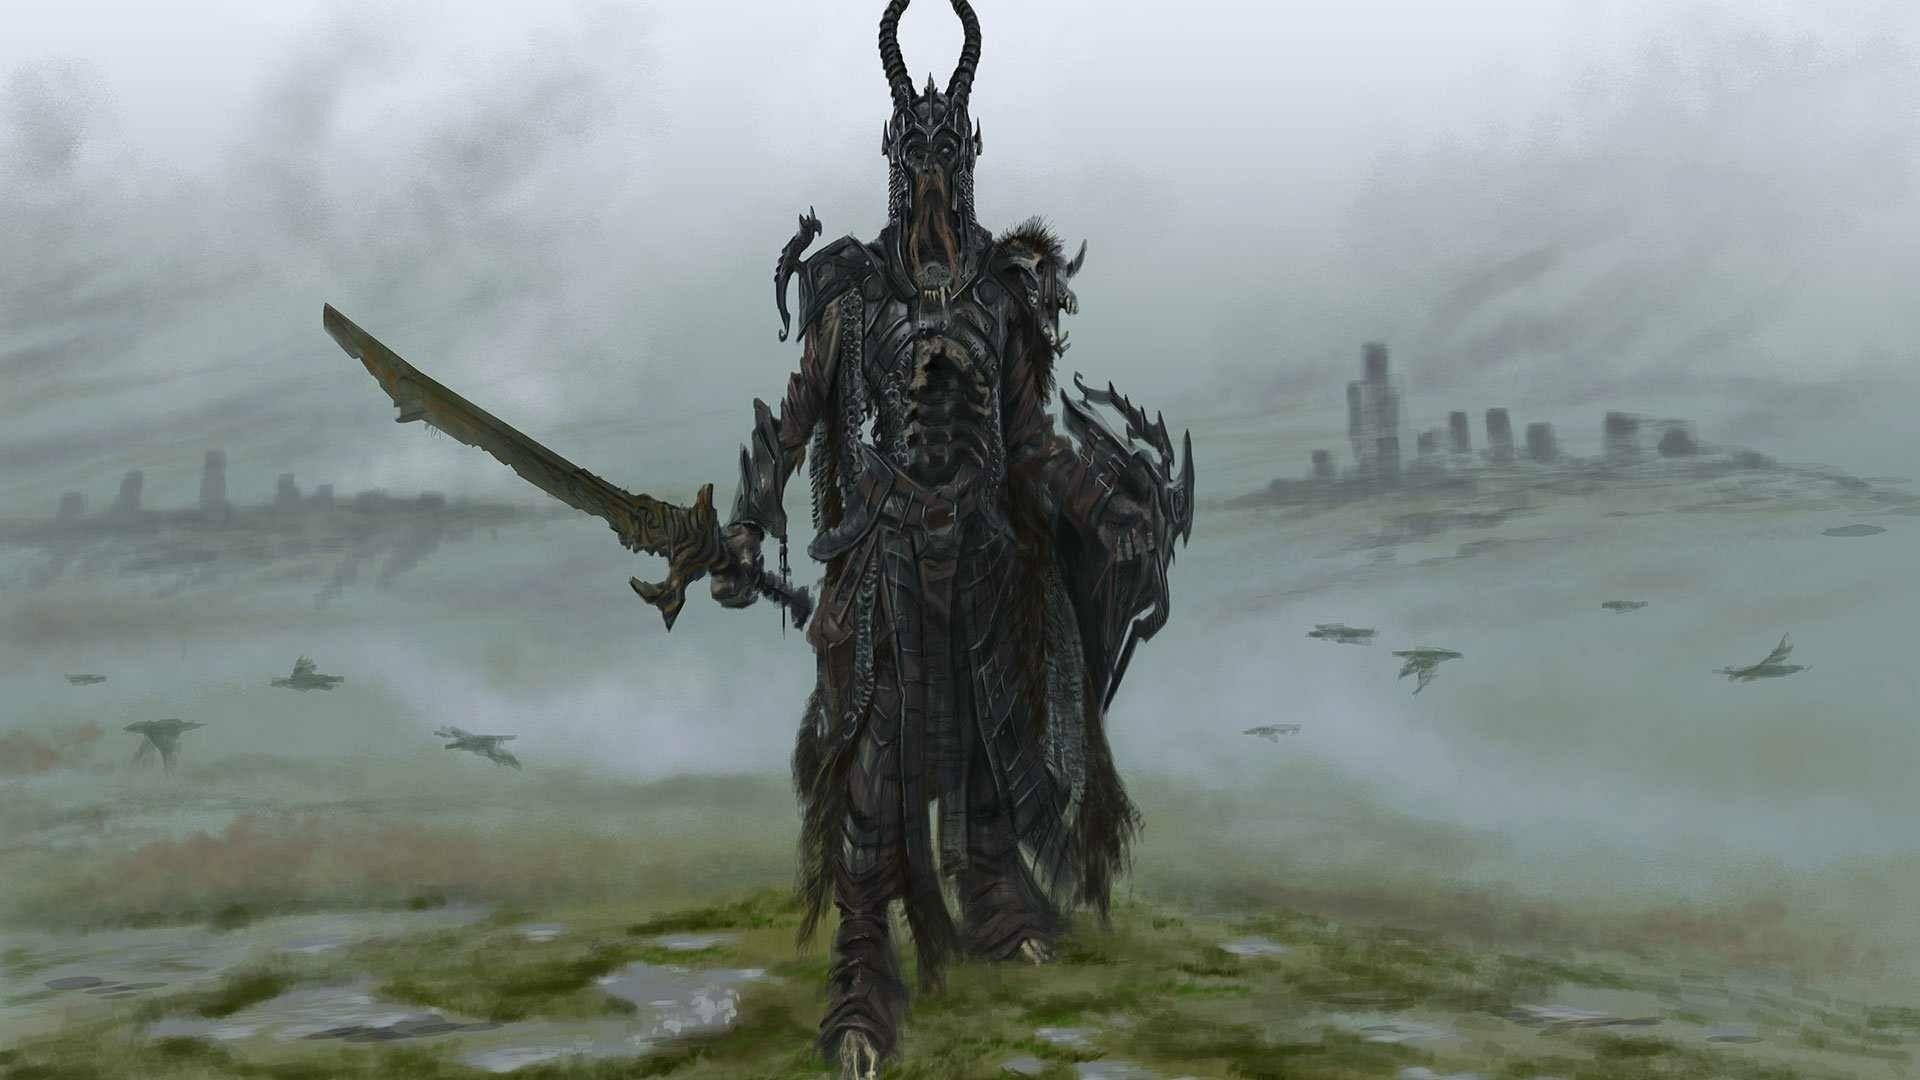 Pin By Bryson Speer On Elder Scrolls Elder Scrolls V Skyrim